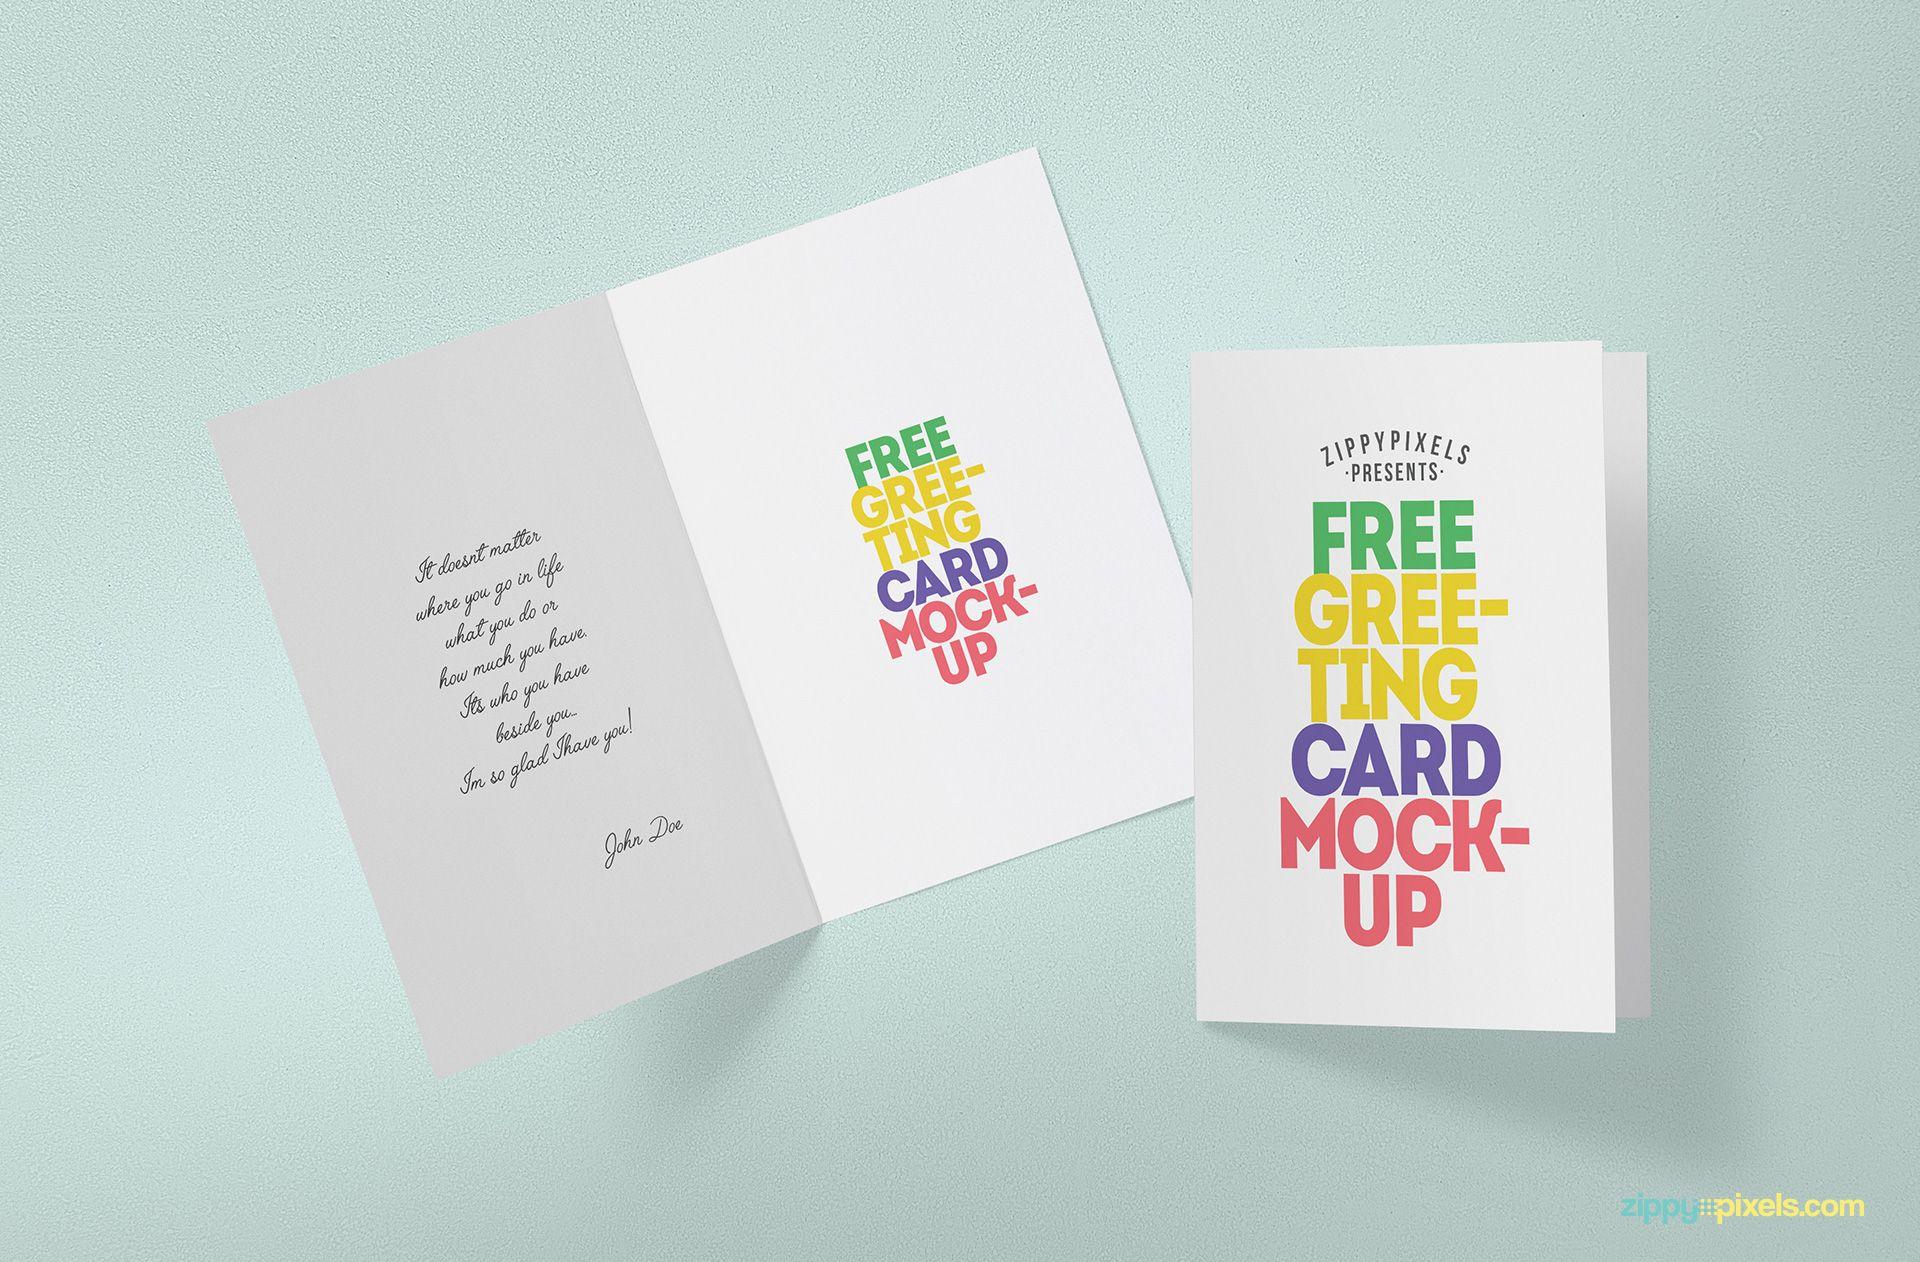 Free Greeting Card Mockup Free Greeting Cards Greeting Card